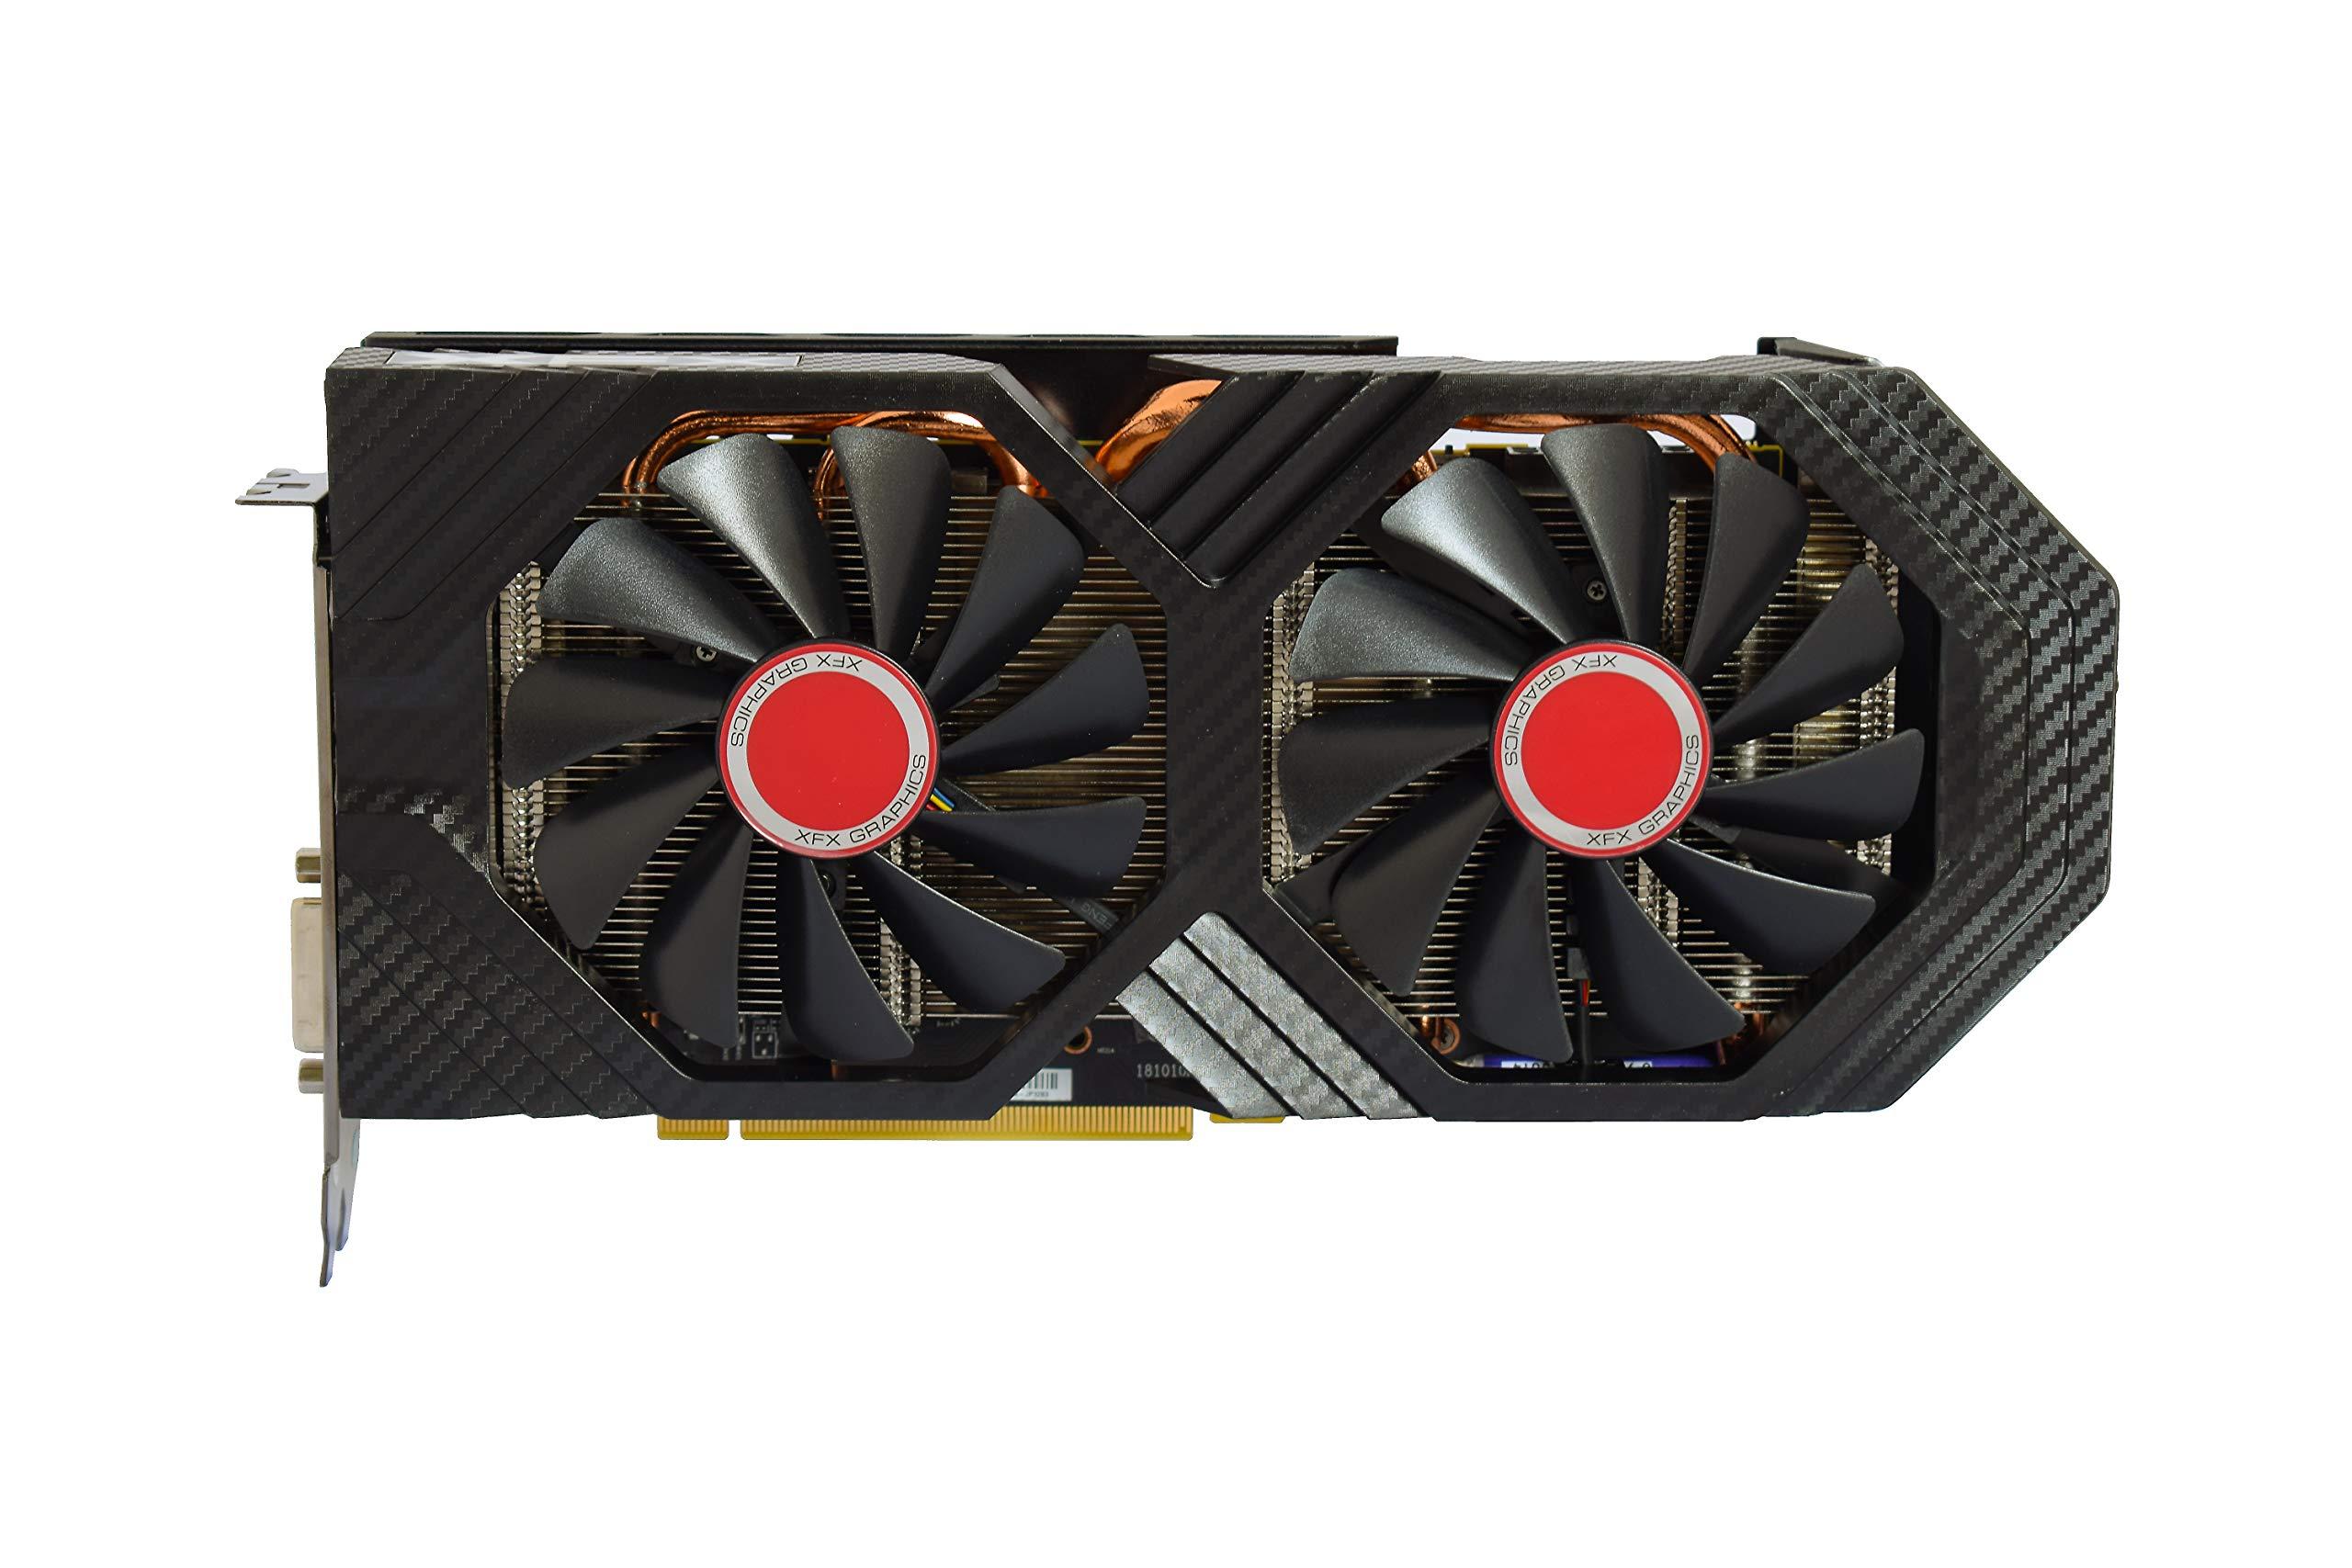 XFX RX-590P8DFD6 Radeon Rx 590 Fatboy 8GB OC+ 1580MHz DDR5 3xDP HDMI DVI Graphic Cards by XFX (Image #4)